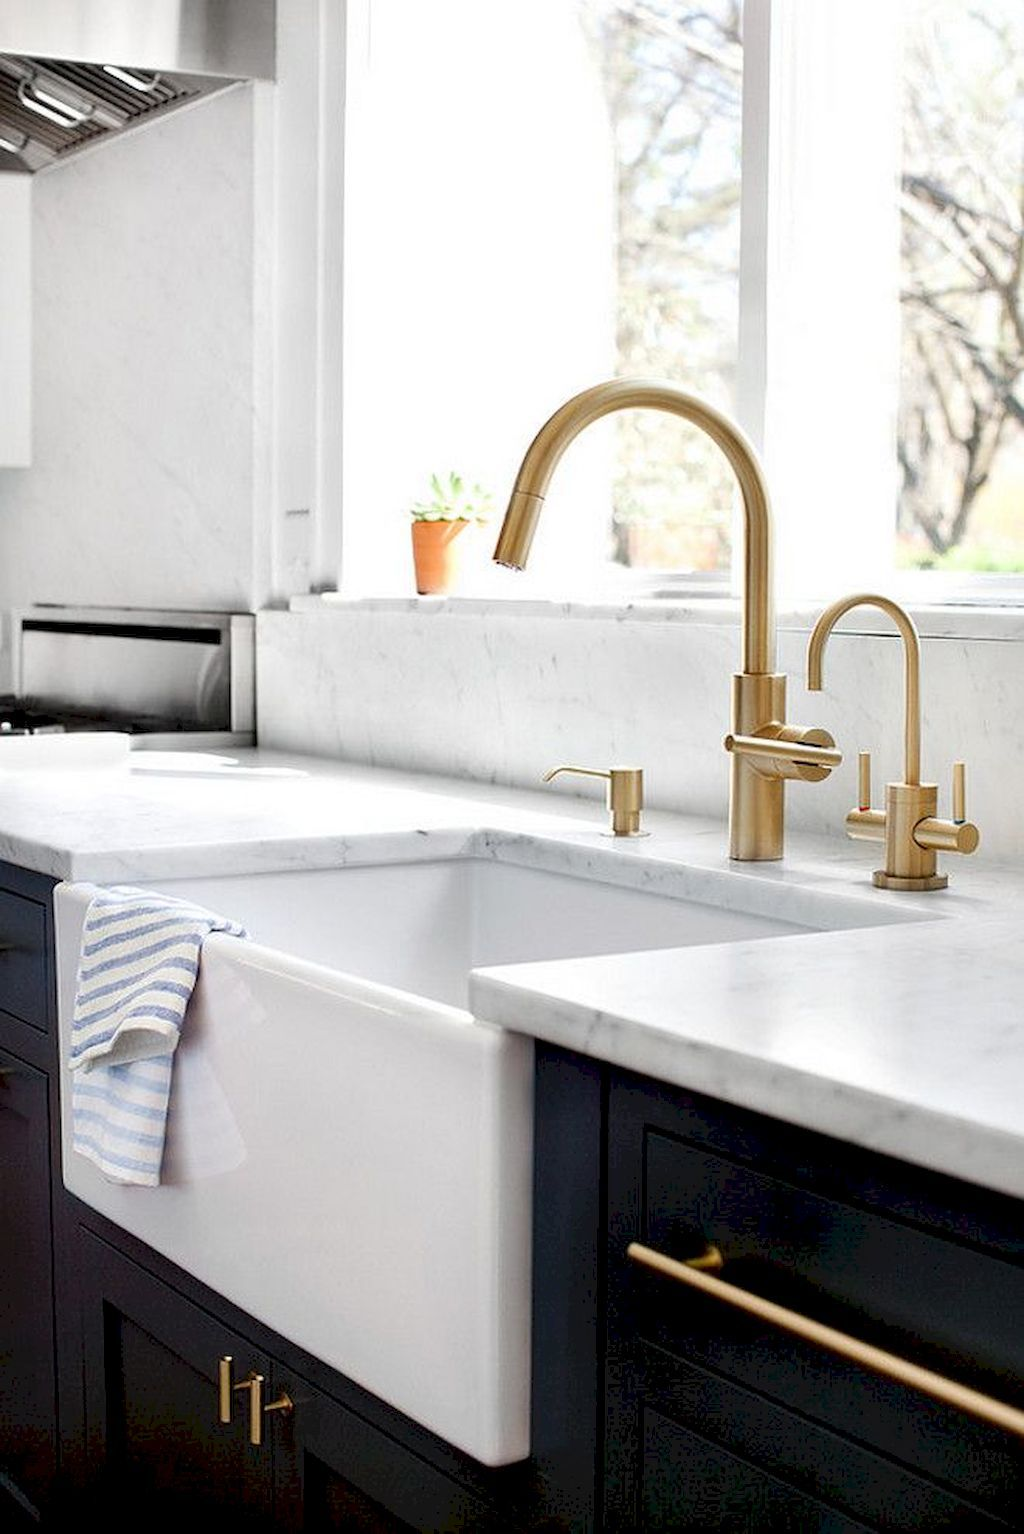 The Best Farmhouse Kitchen Sinks Kitchen Renovation Design Brass Kitchen Faucet Farmhouse Sink Kitchen